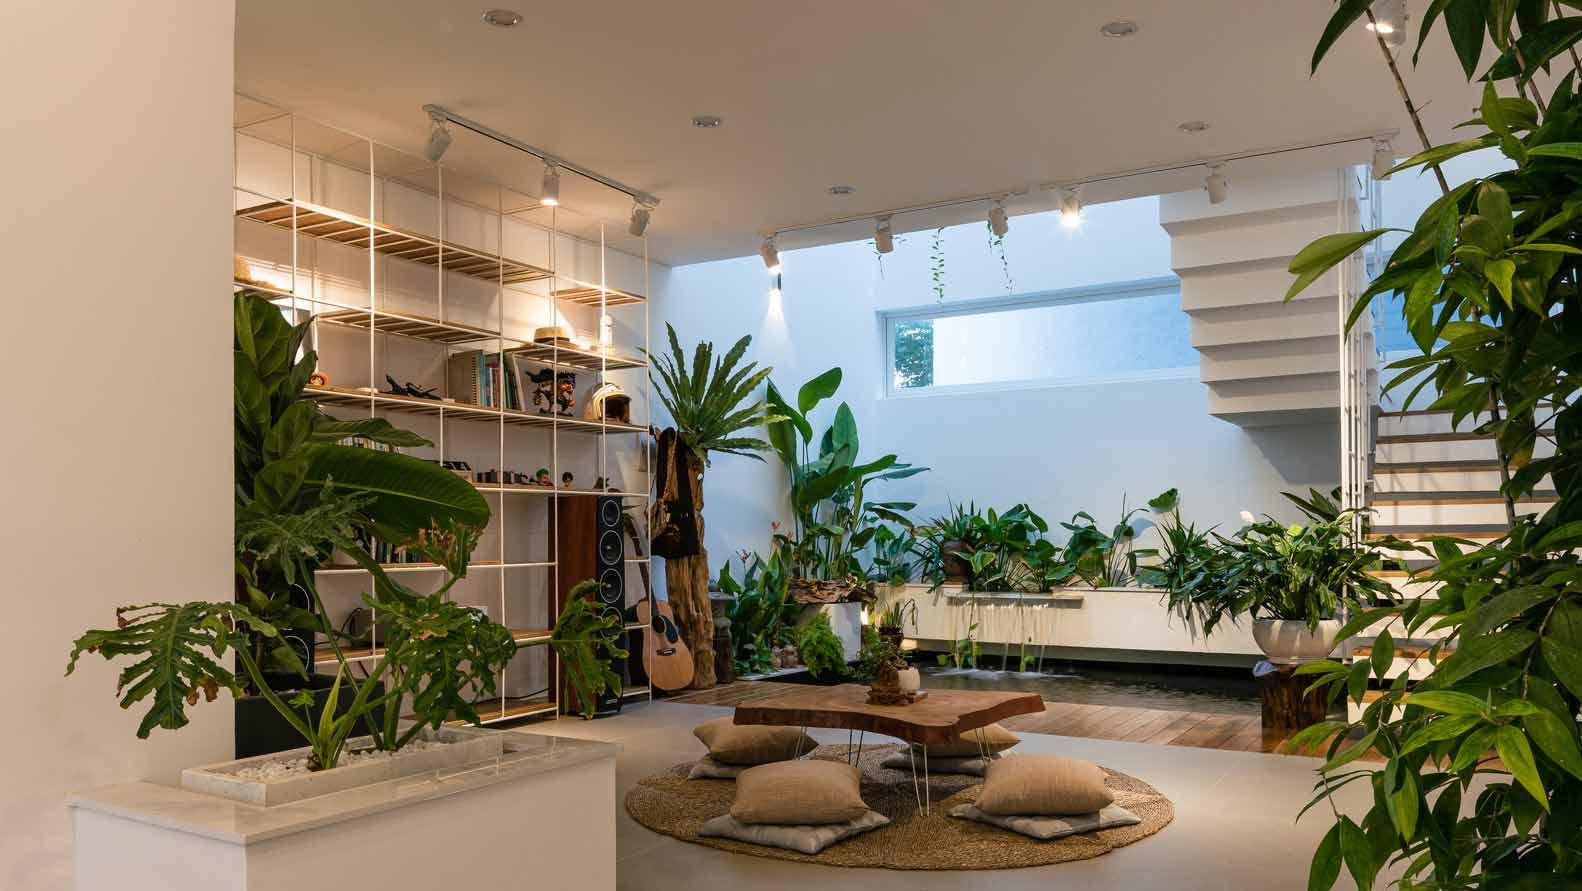 Desain Rumah Minimalis Dengan Hamparan Tanaman Hijau Yang Menyejukkan -  ARSITAG